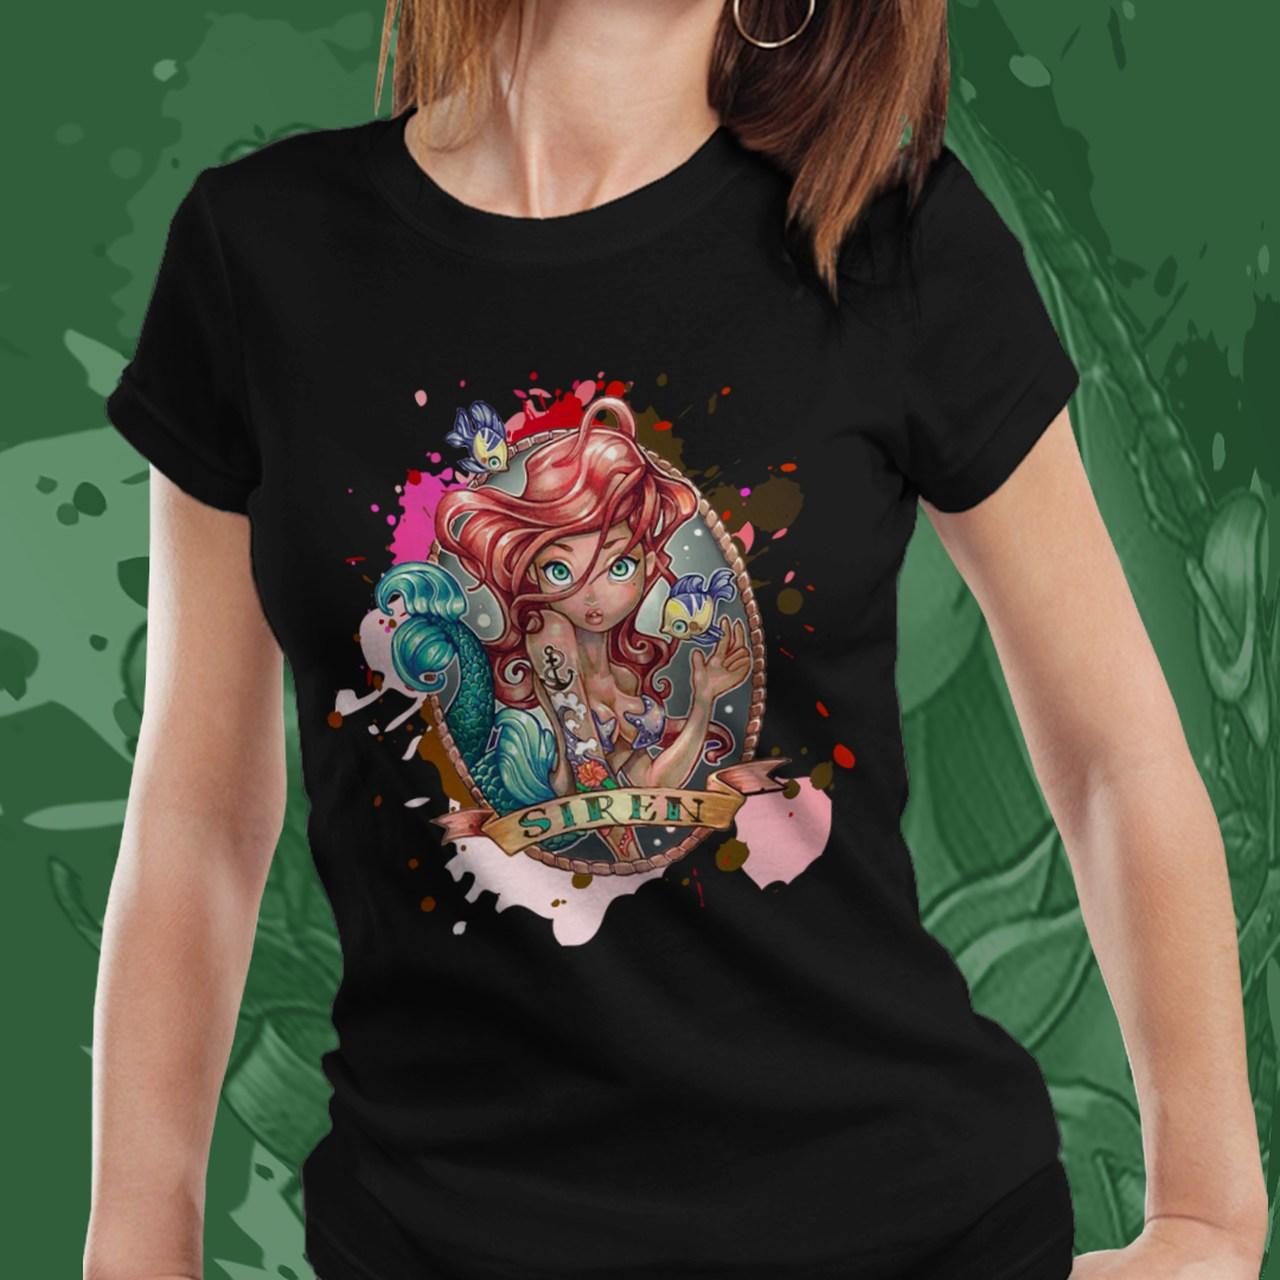 Camiseta Feminina Ariel: Princesa Ariel - Disney (Preto) - EV